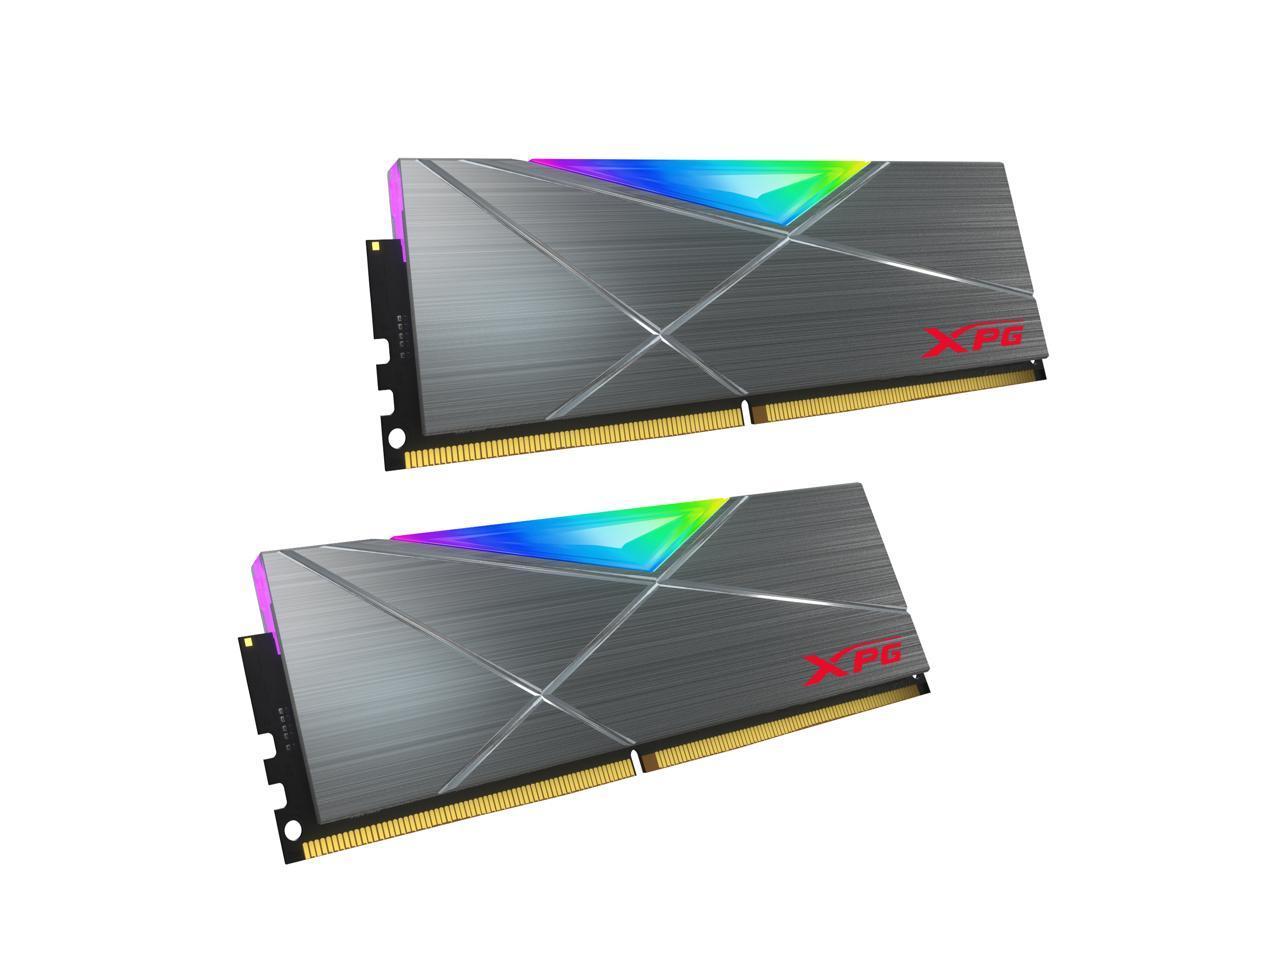 XPG SPECTRIX D50 16GB (2 x 8GB) DDR4 3600 (PC4 28800) CL18 RGB Desktop Memory + $10 Newegg Gift Card for $74.99 + FS